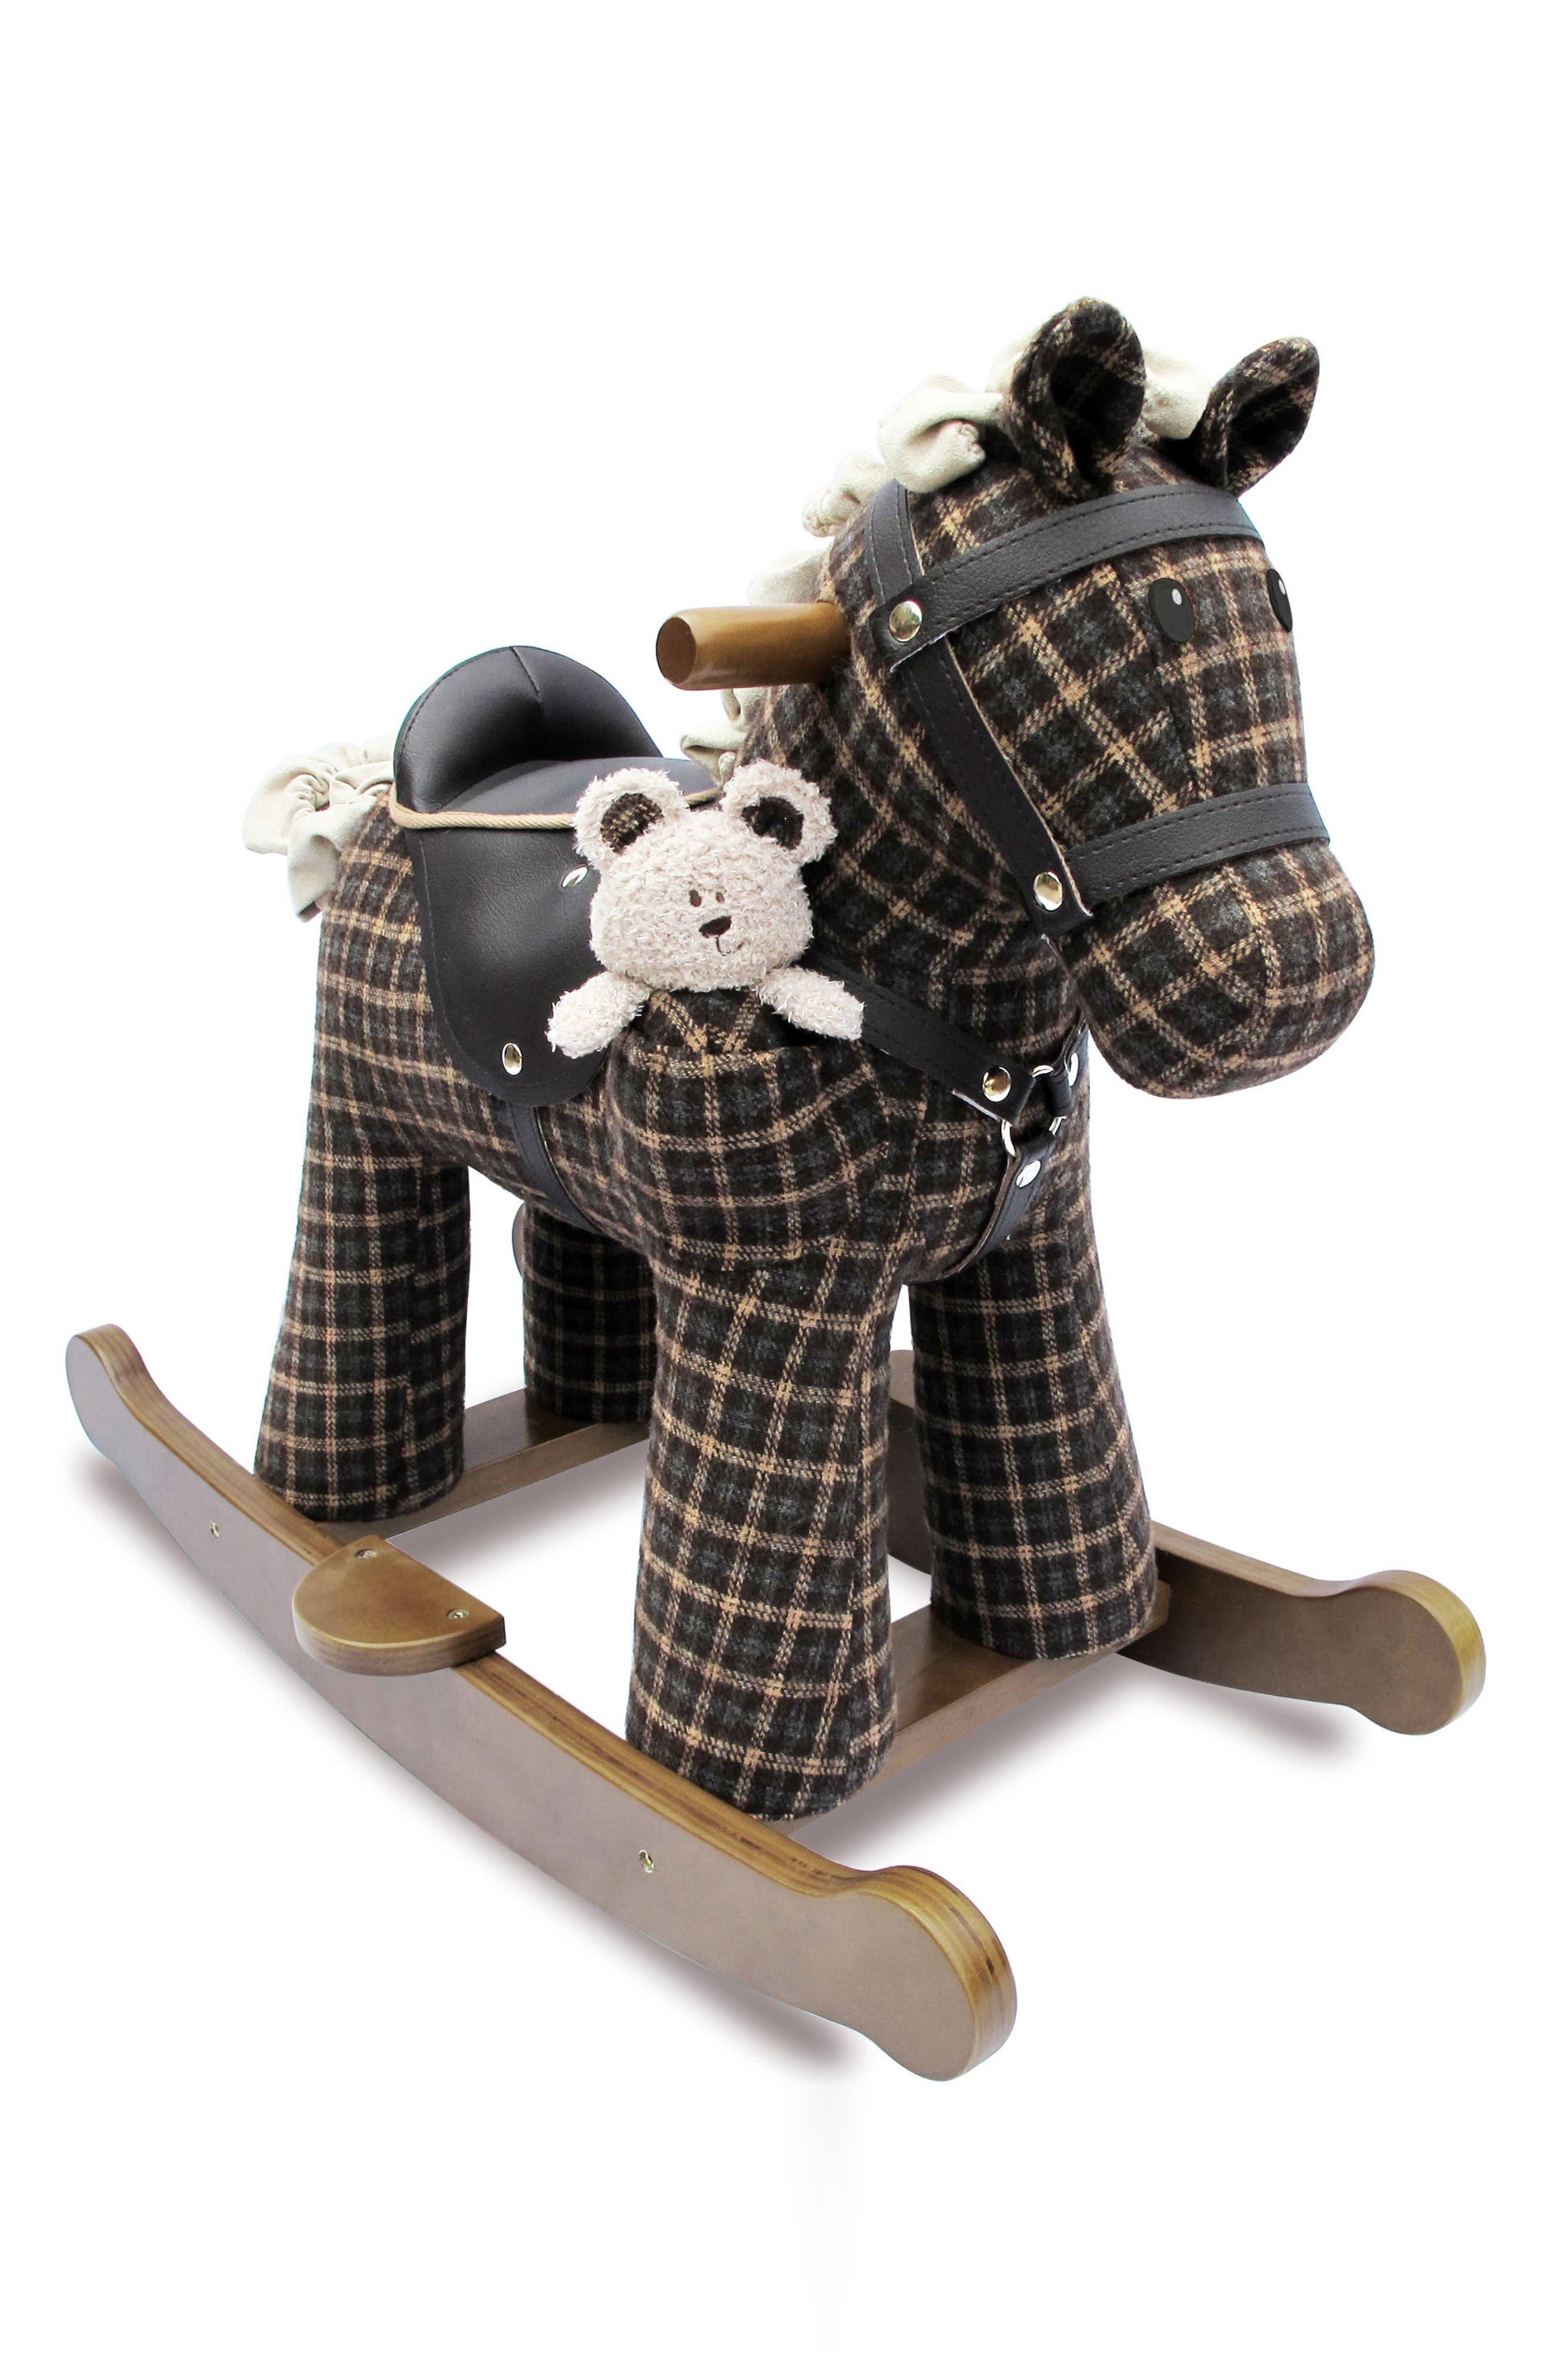 Rufus & Ted Rocking Horse & Stuffed Animal,                             Alternate thumbnail 2, color,                             200